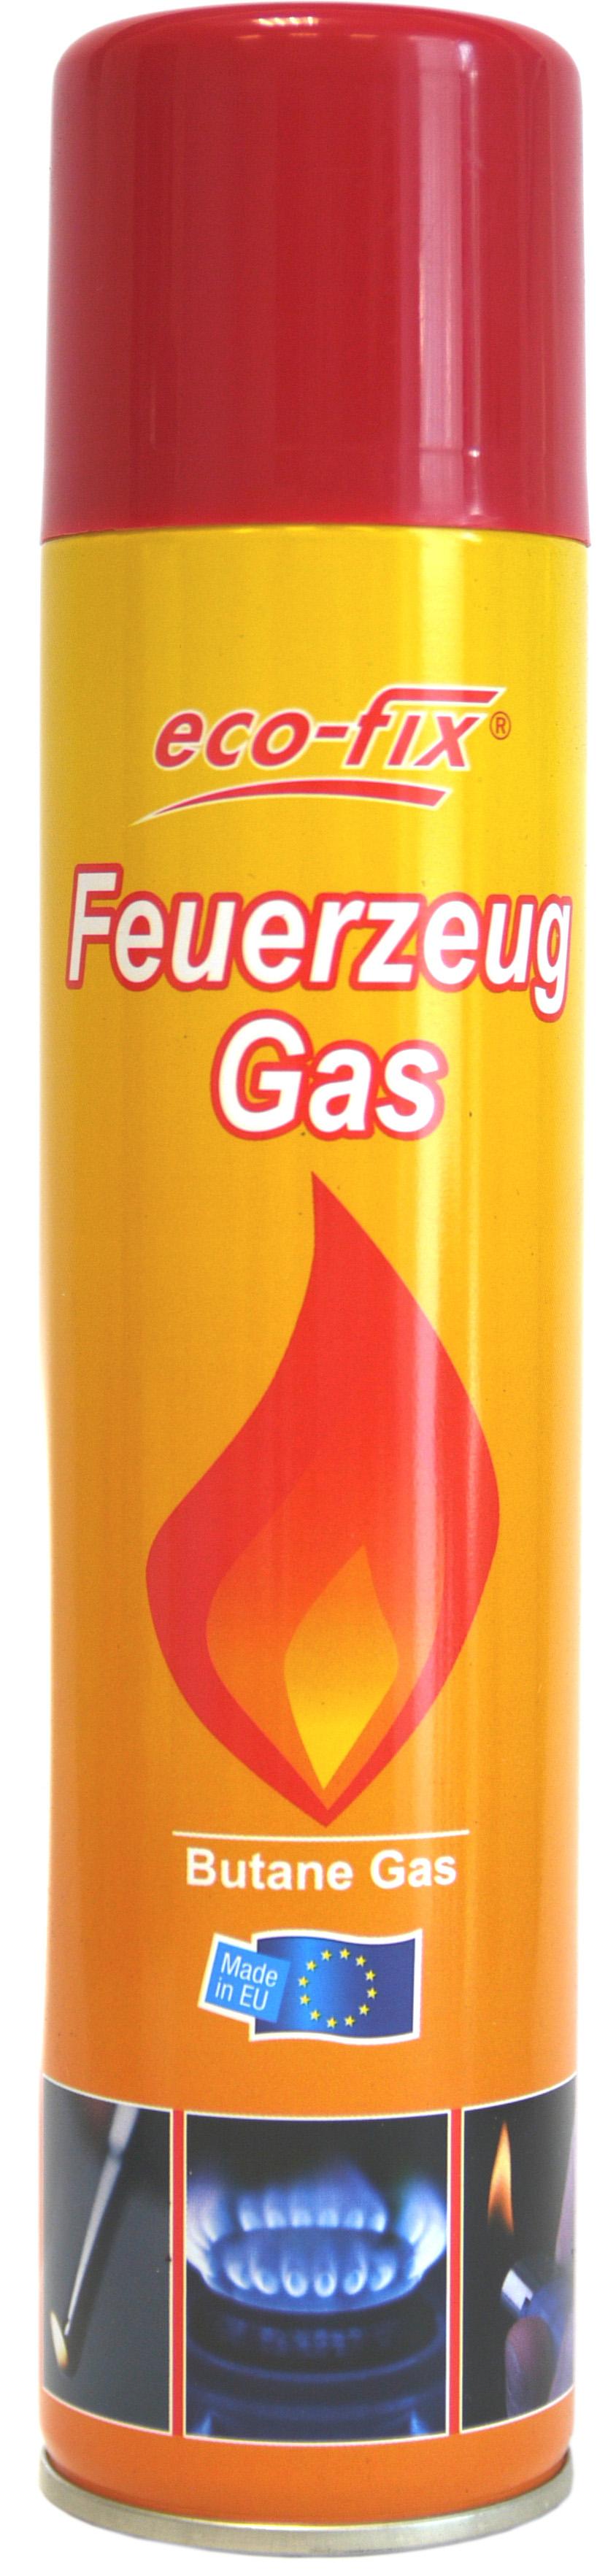 20001 - ecofix Feuerzeug Gas 300 ml